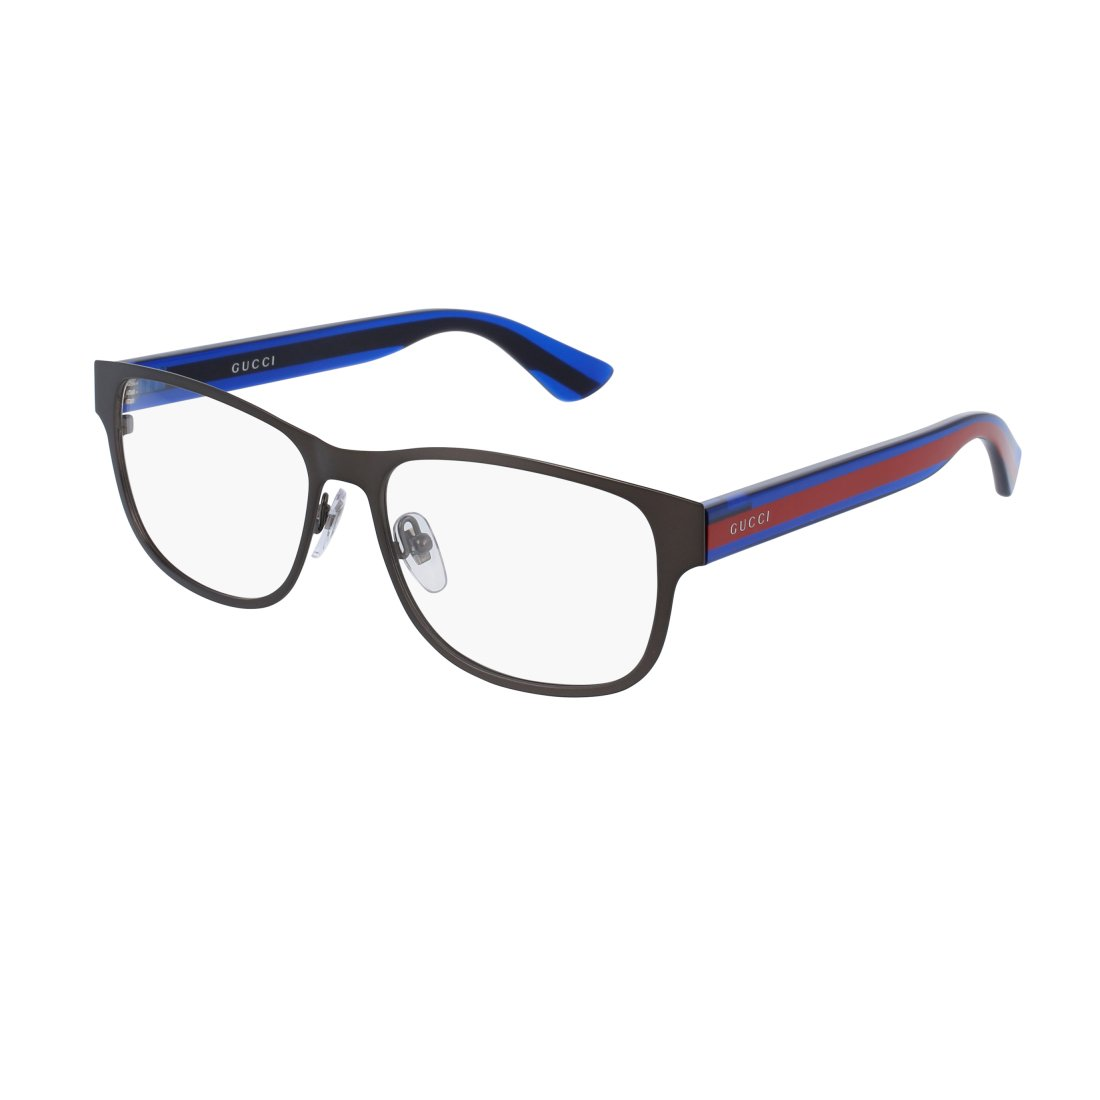 Gucci GG 0007O 003 Ruthenium Metal Rectangle Eyeglasses 55mm